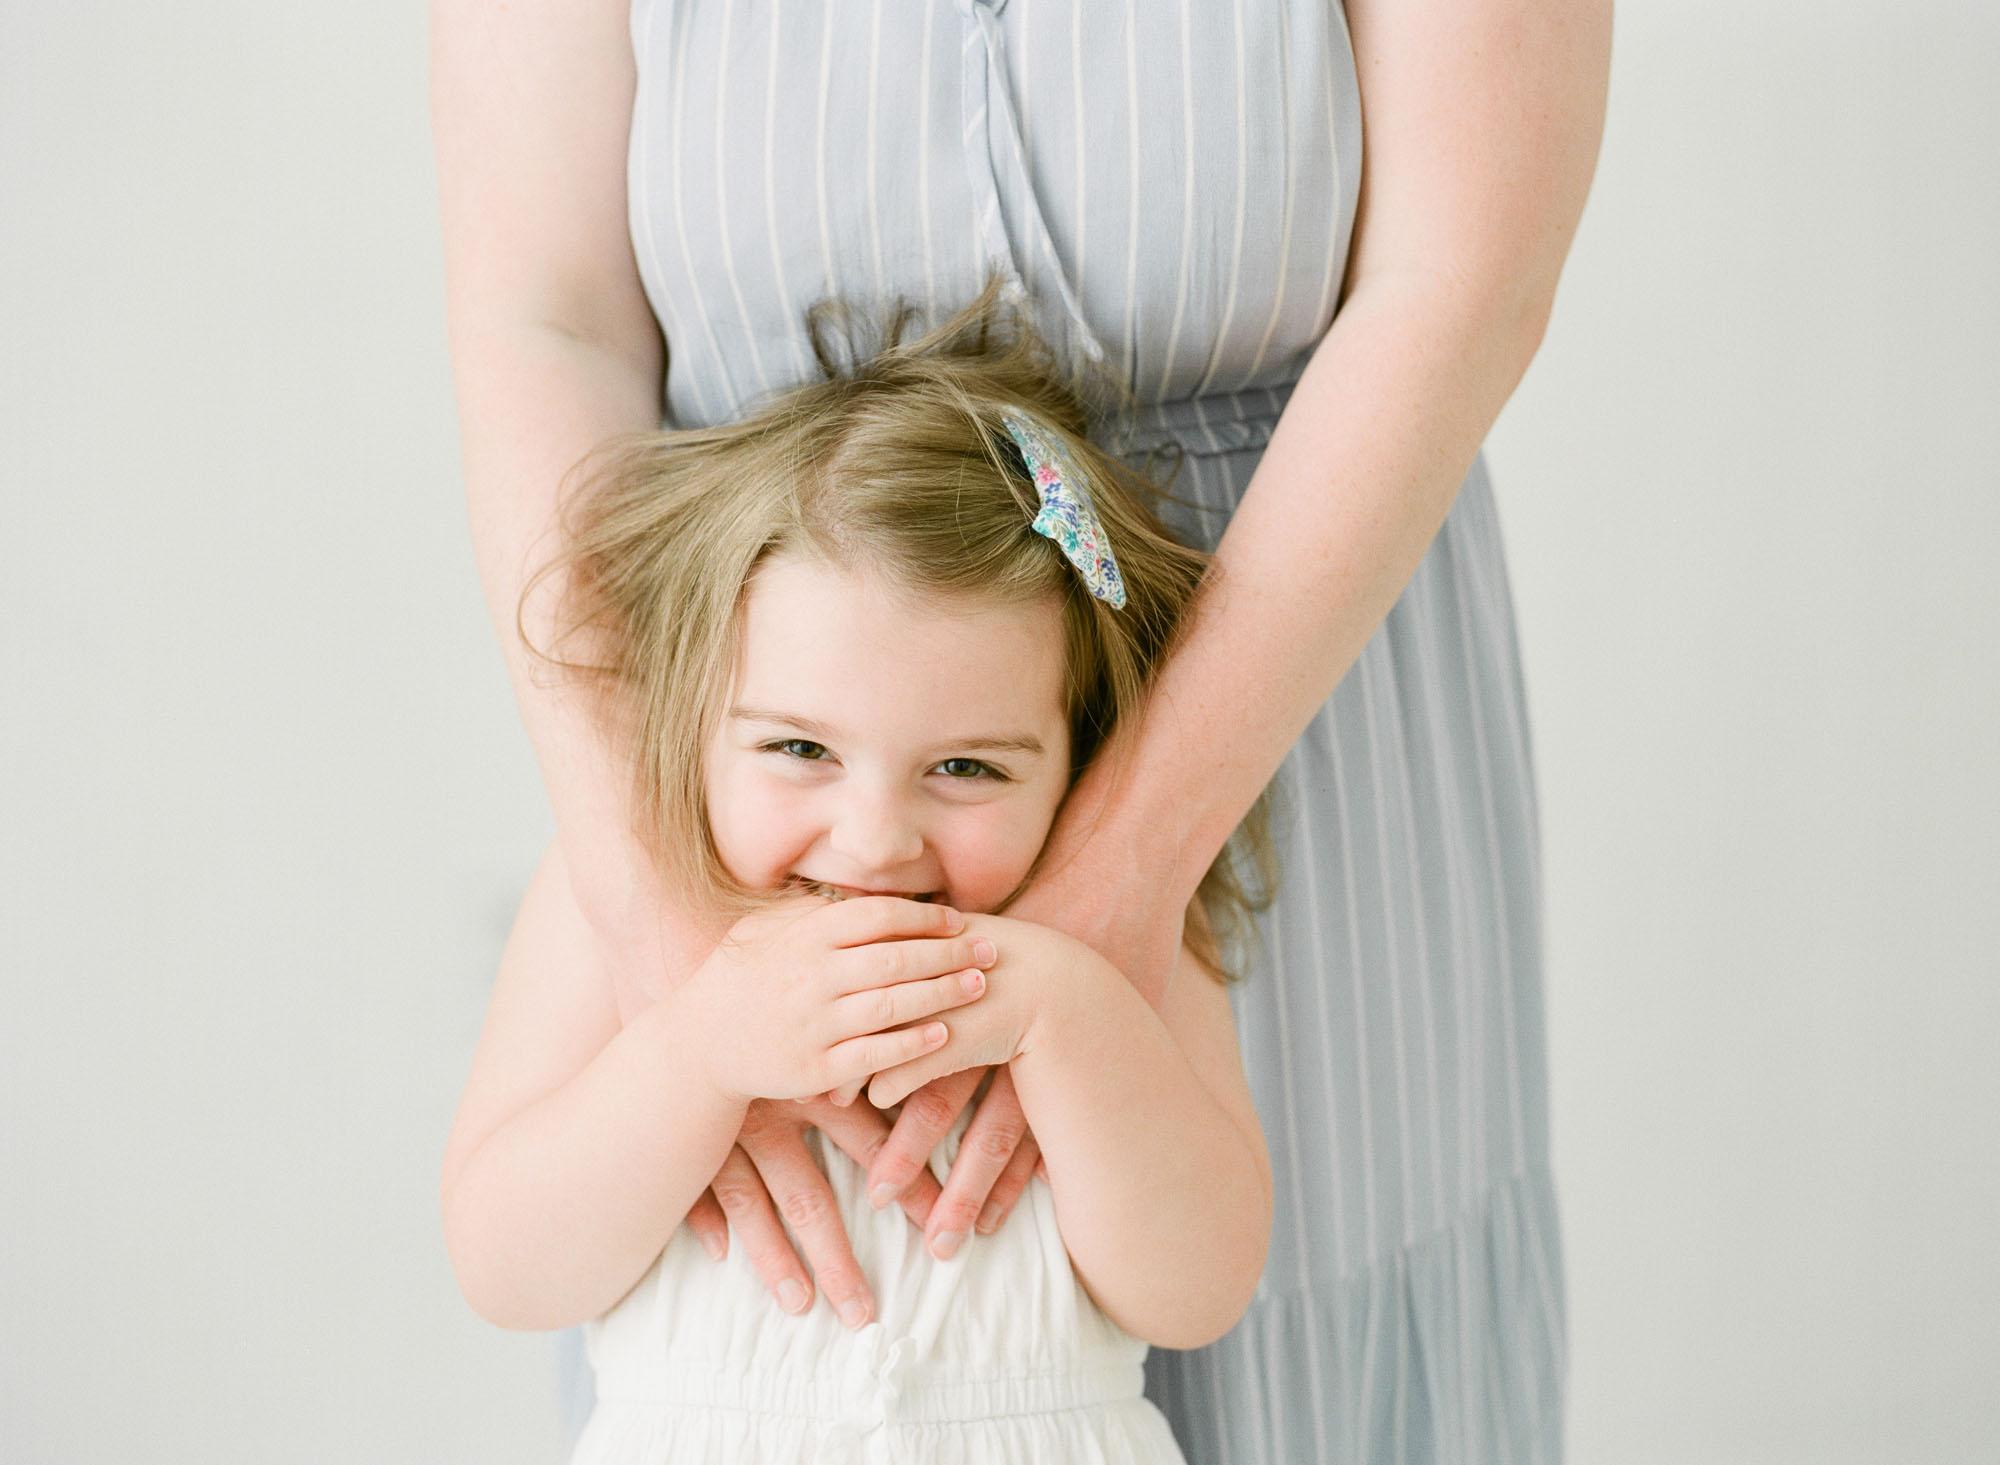 raleigh-best-family-photographer-studio-session-motherhood